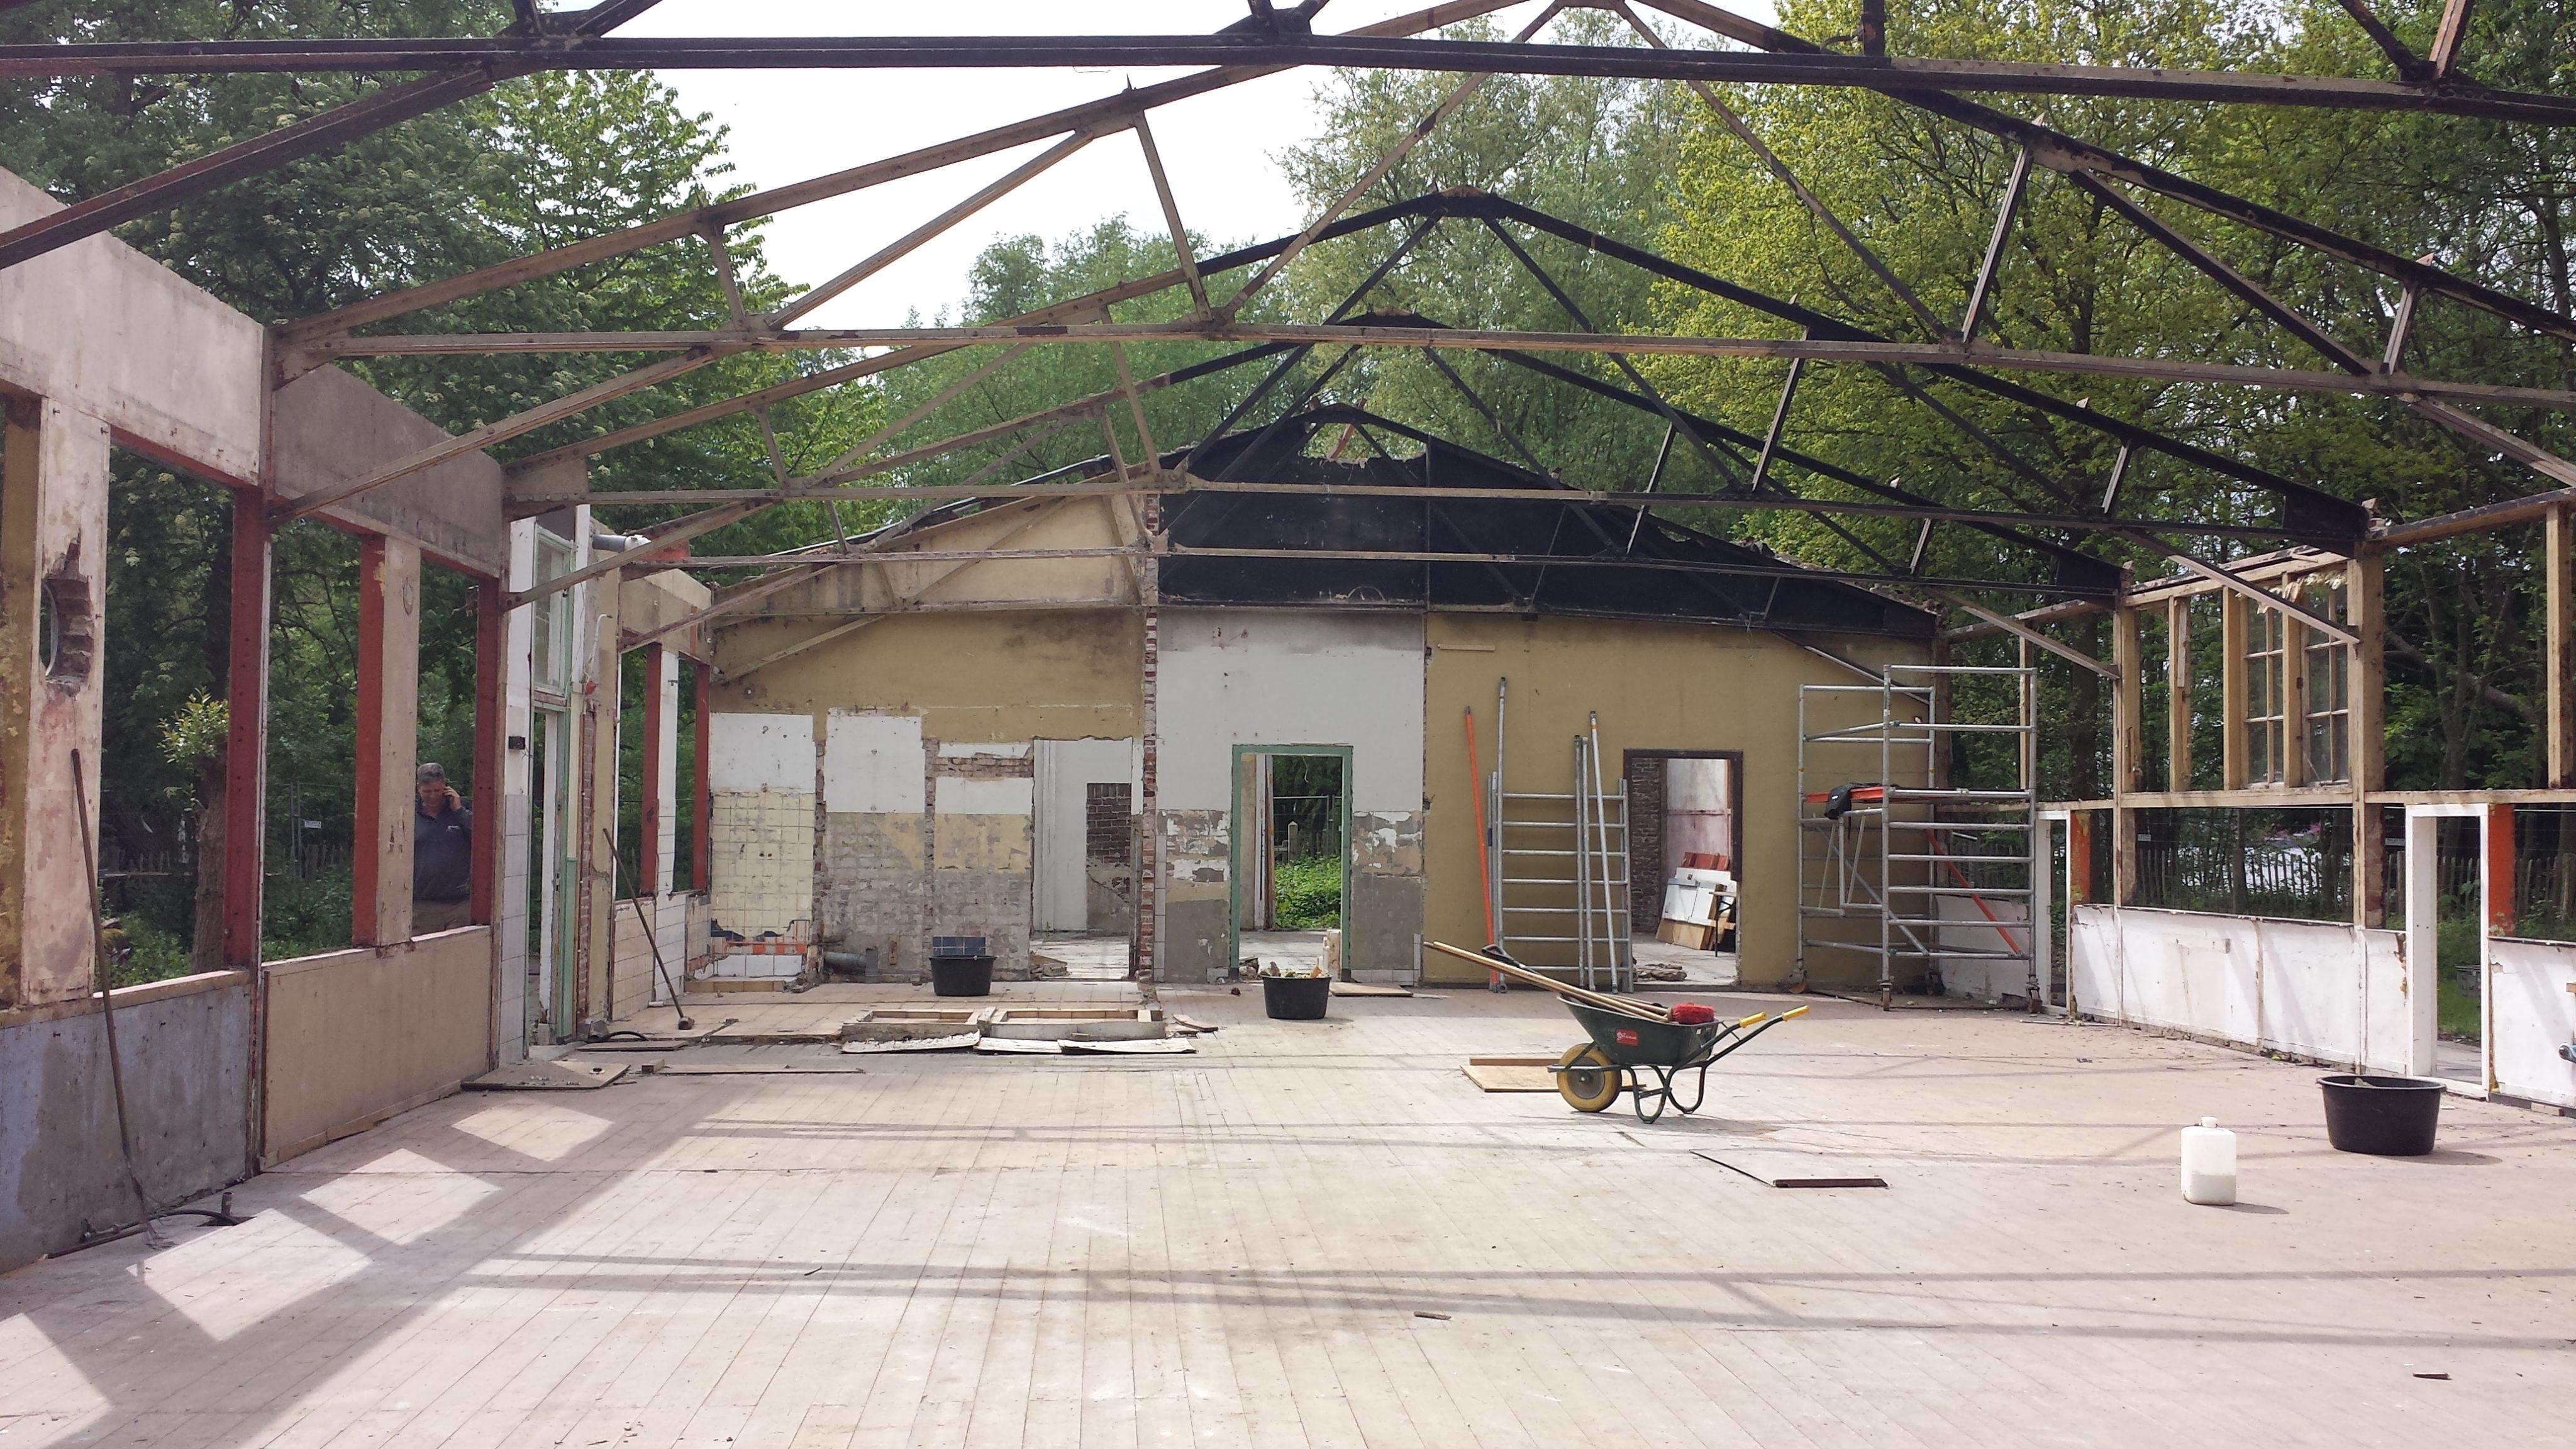 The Kamphuis during deconstruction.